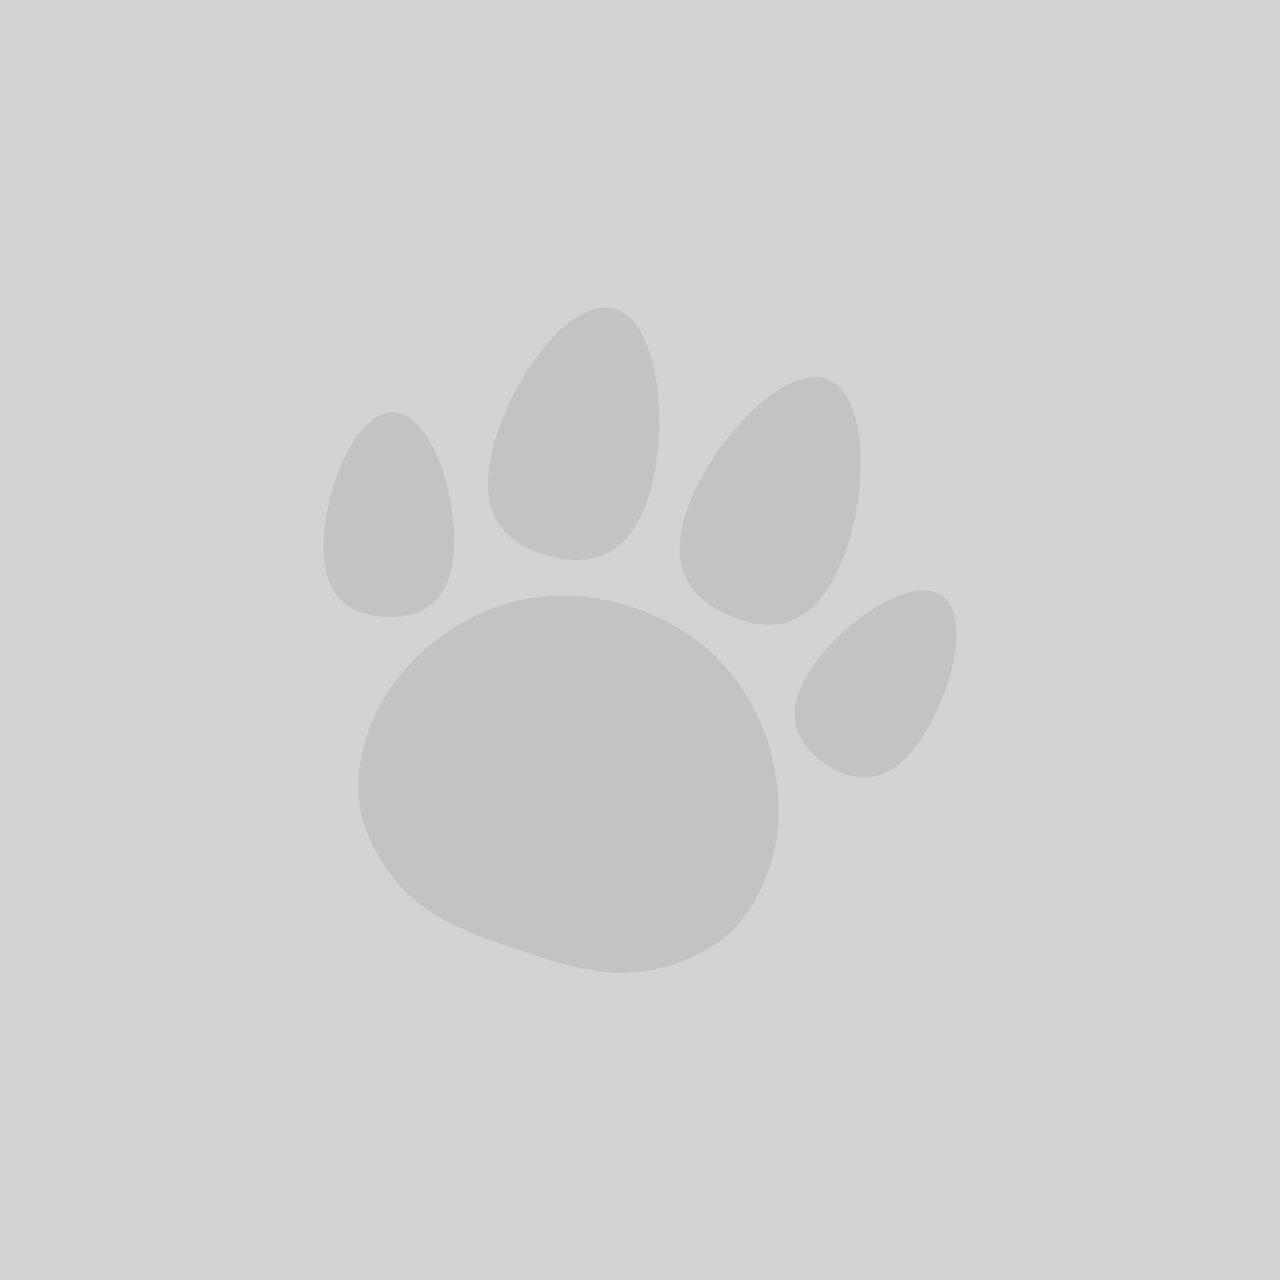 Adaptil Appeasing Pheromone Small & Medium Dog Collar